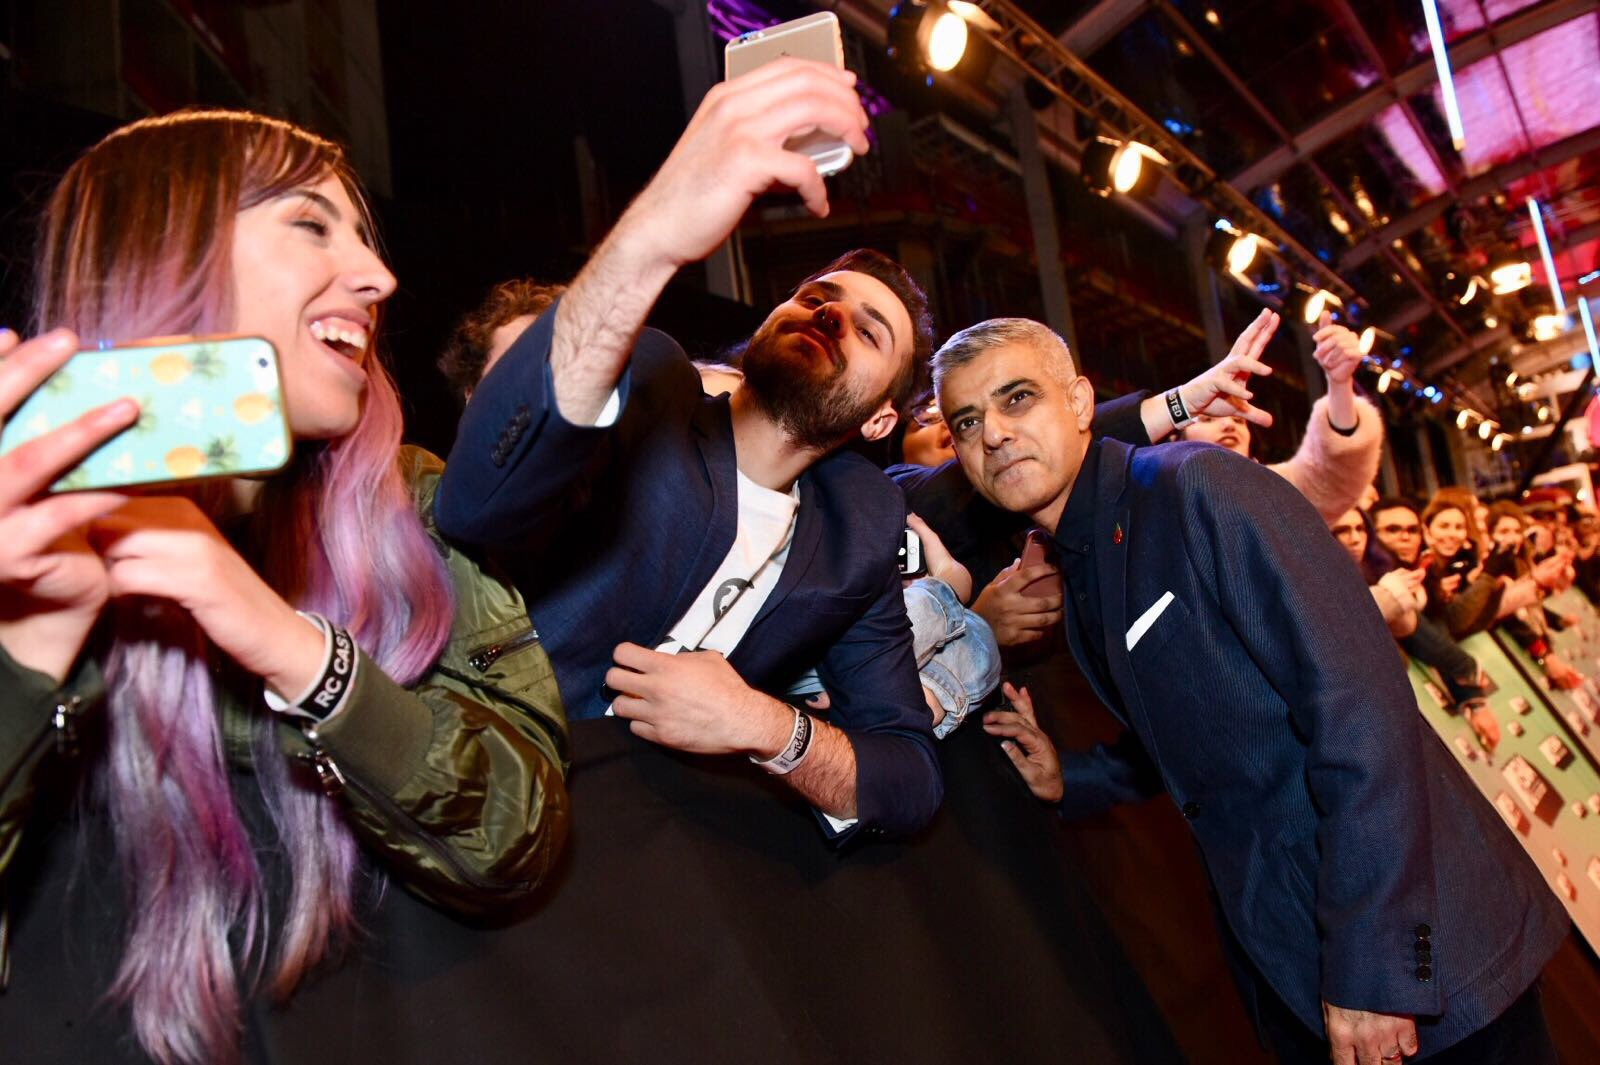 London, are you ready for #MTVEMA 2017? #LondonIsOpen https://t.co/SWTqvZ4Lma